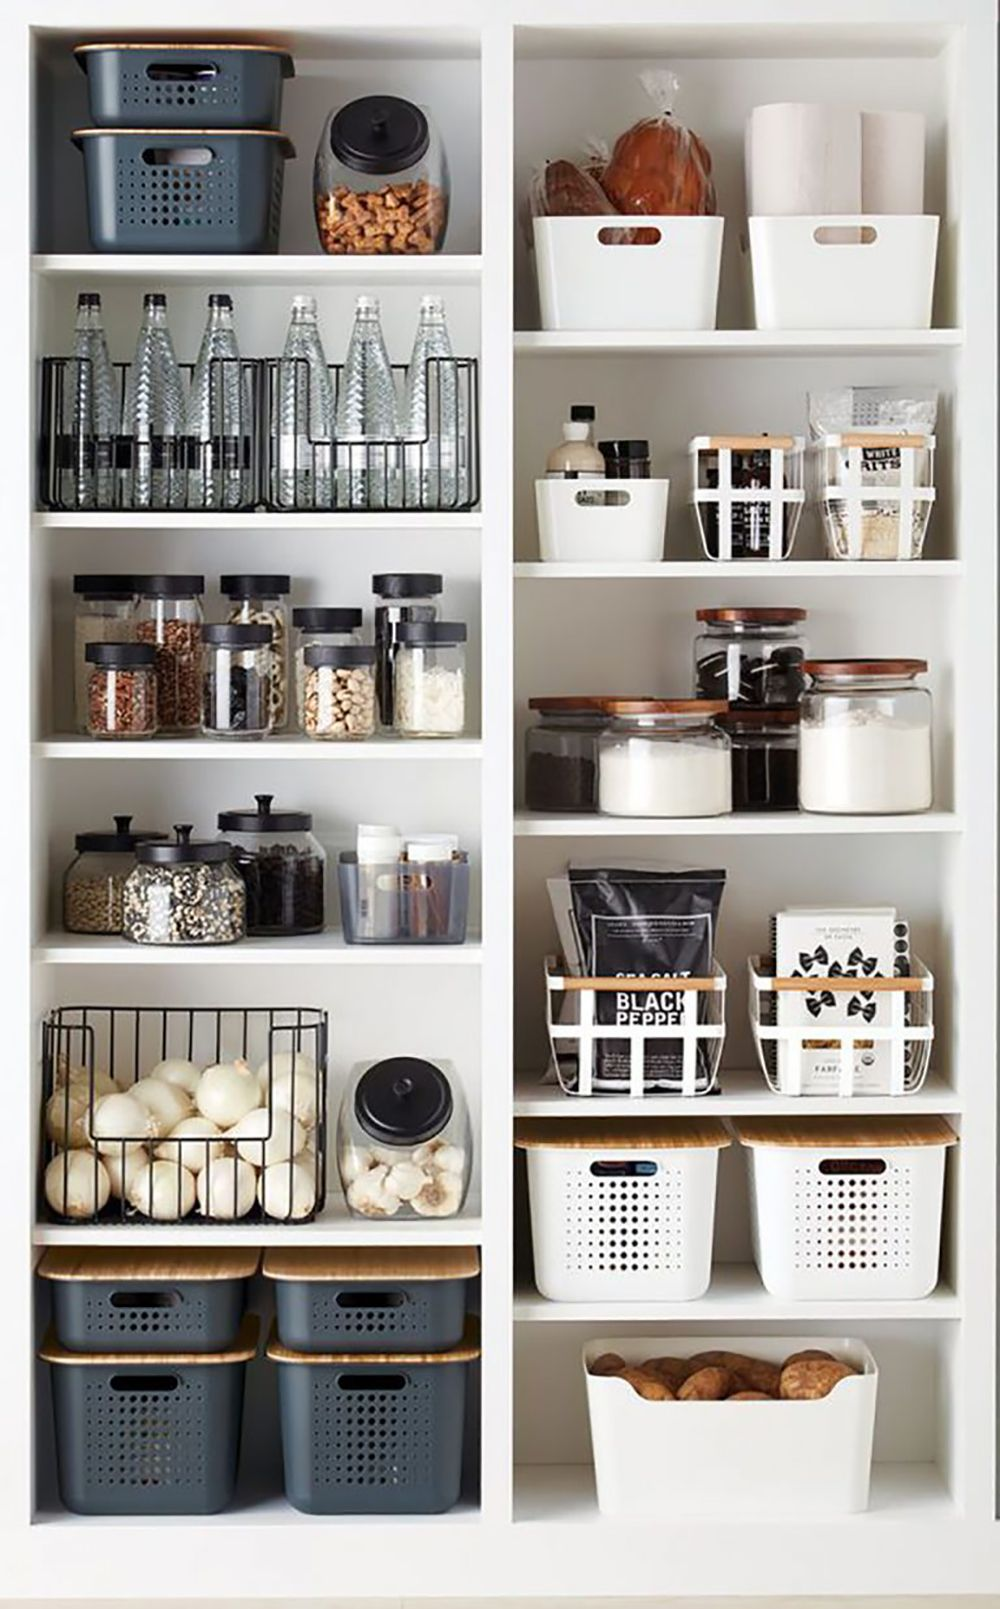 Pantry Design and Organization Inspiration